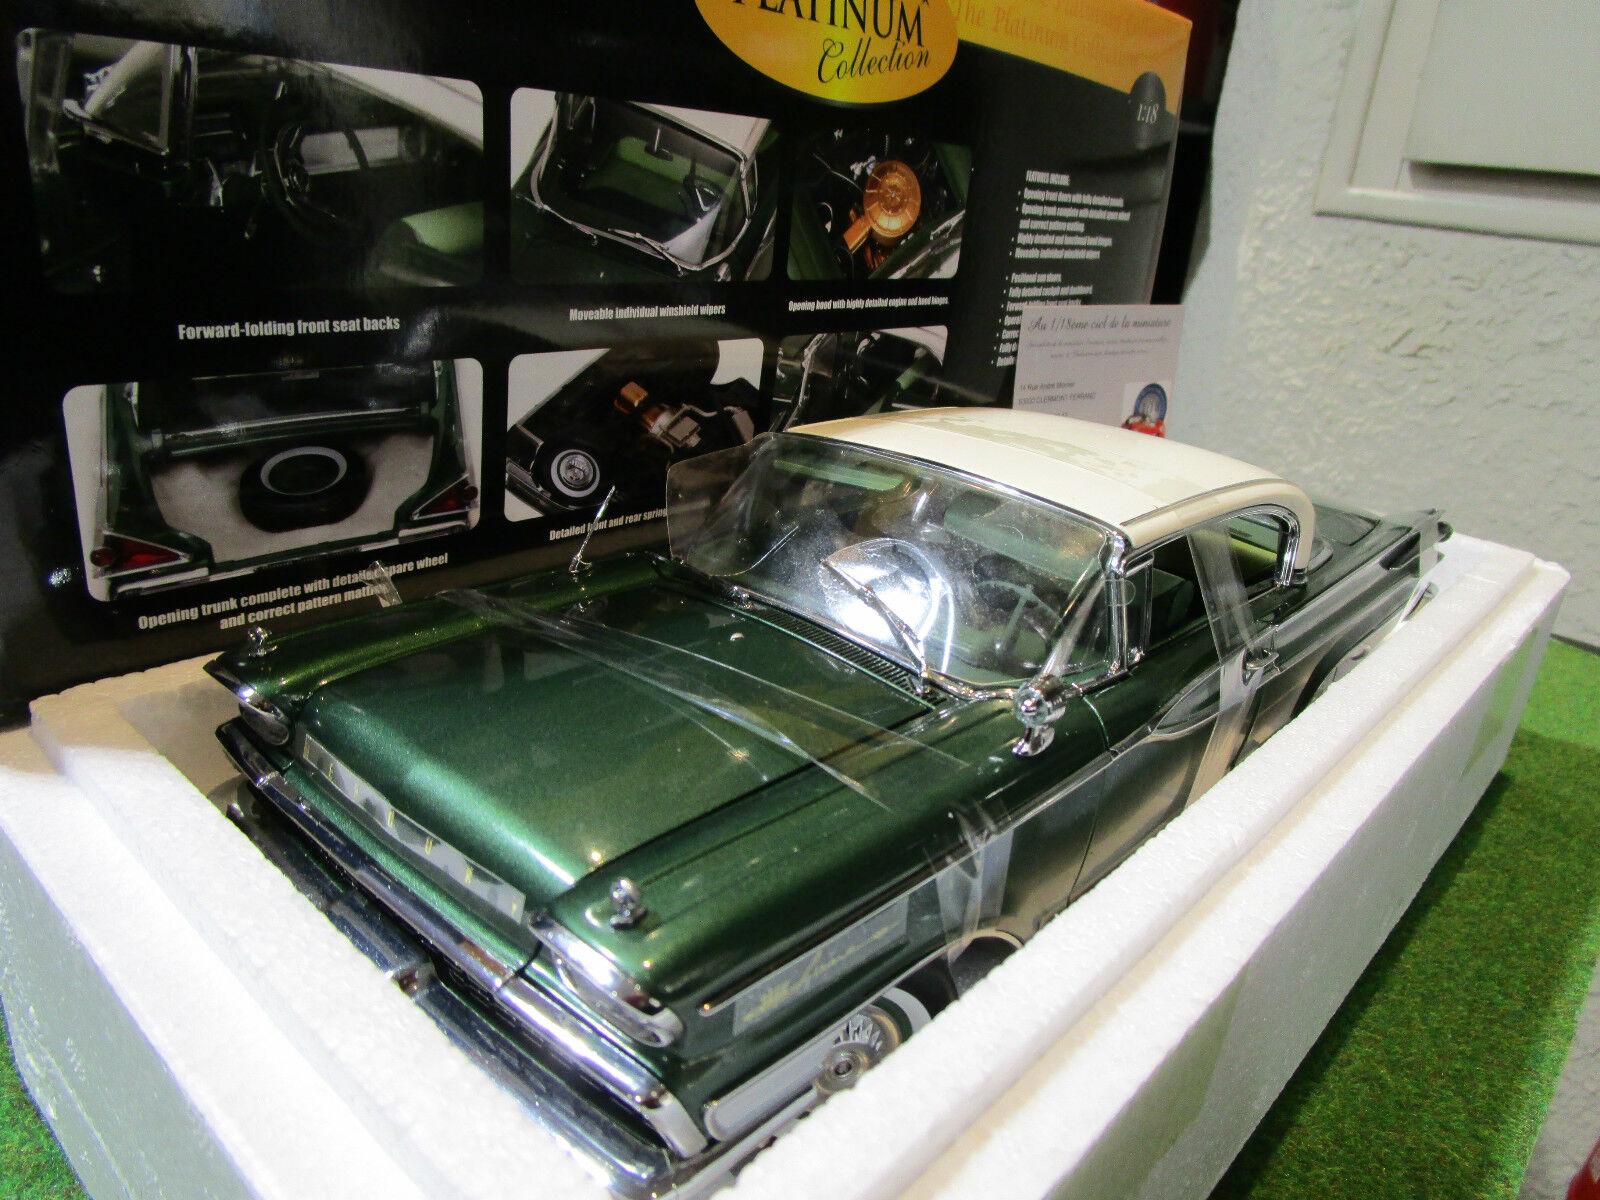 MERCURY PARK LANE HARD TOP de 1959 verde au 1 18 SUN STAR 5164 voiture miniature